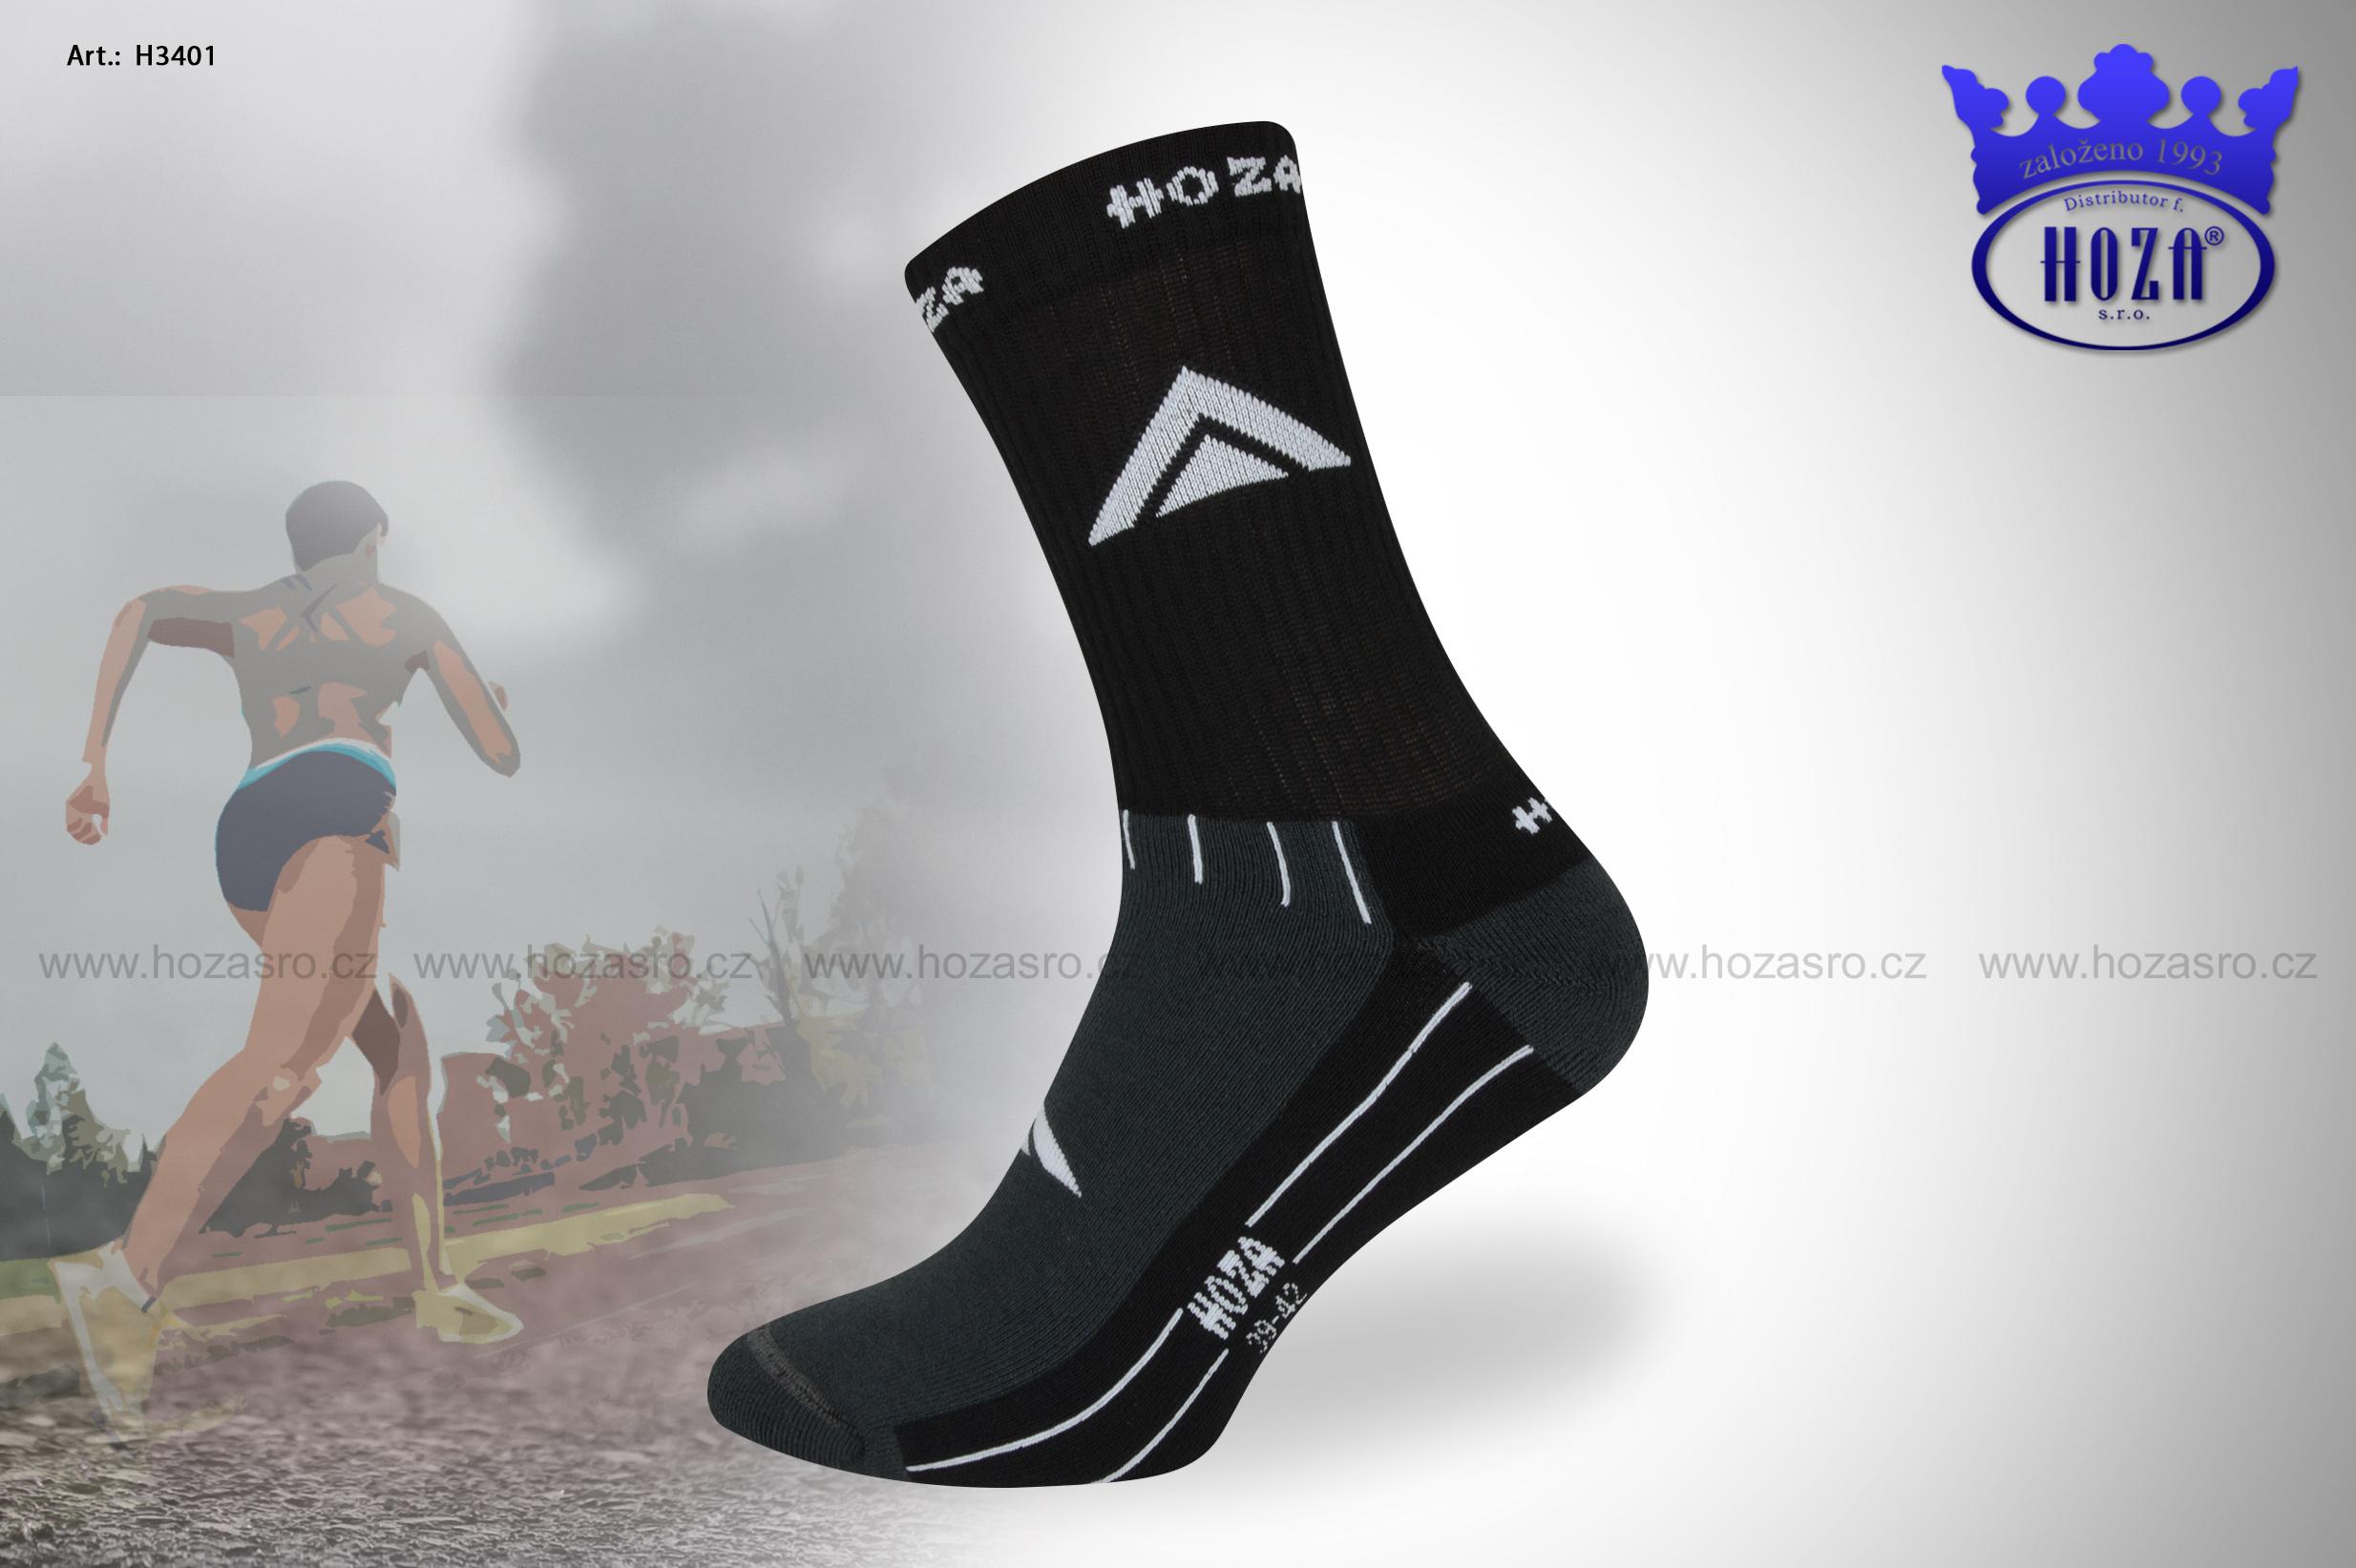 Pánské TERMO HOZA ponožky s froté - H3401